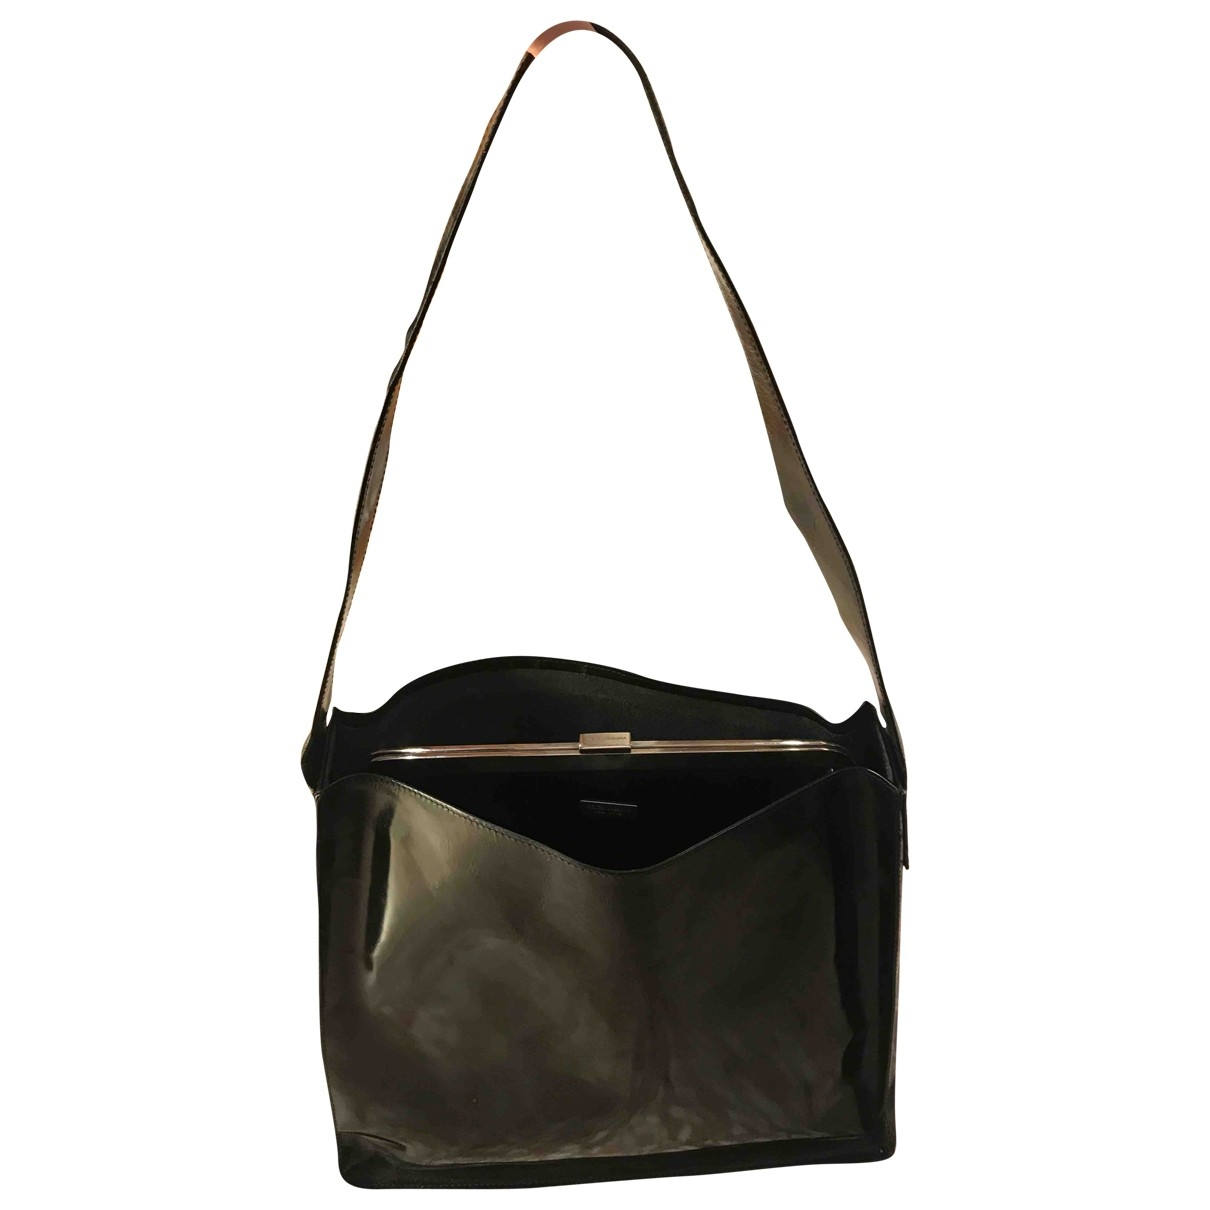 Dolce & Gabbana - Sac a main   pour femme en cuir verni - noir